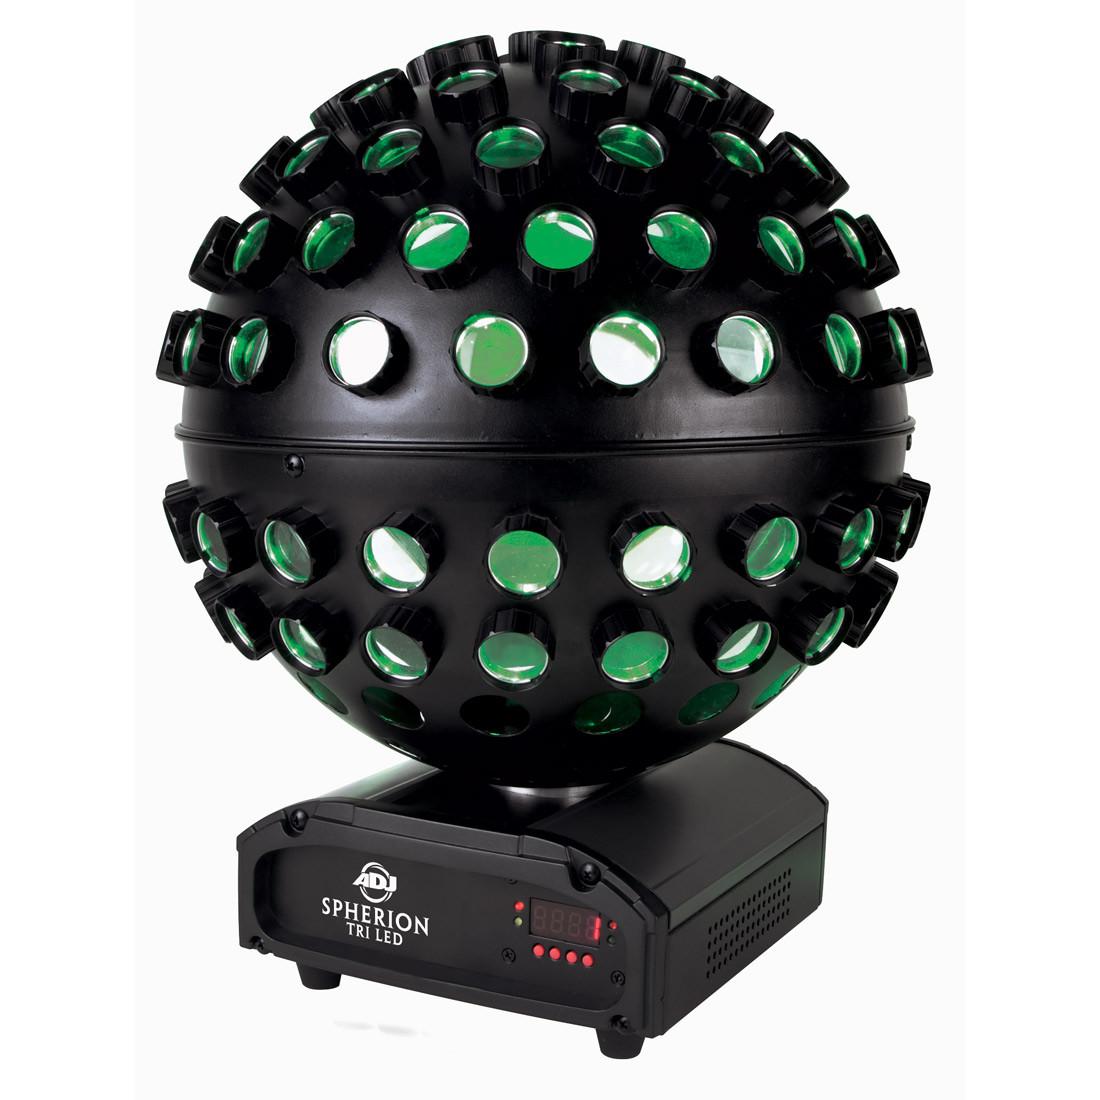 Spherion Tri Led Product Archive Light Lights